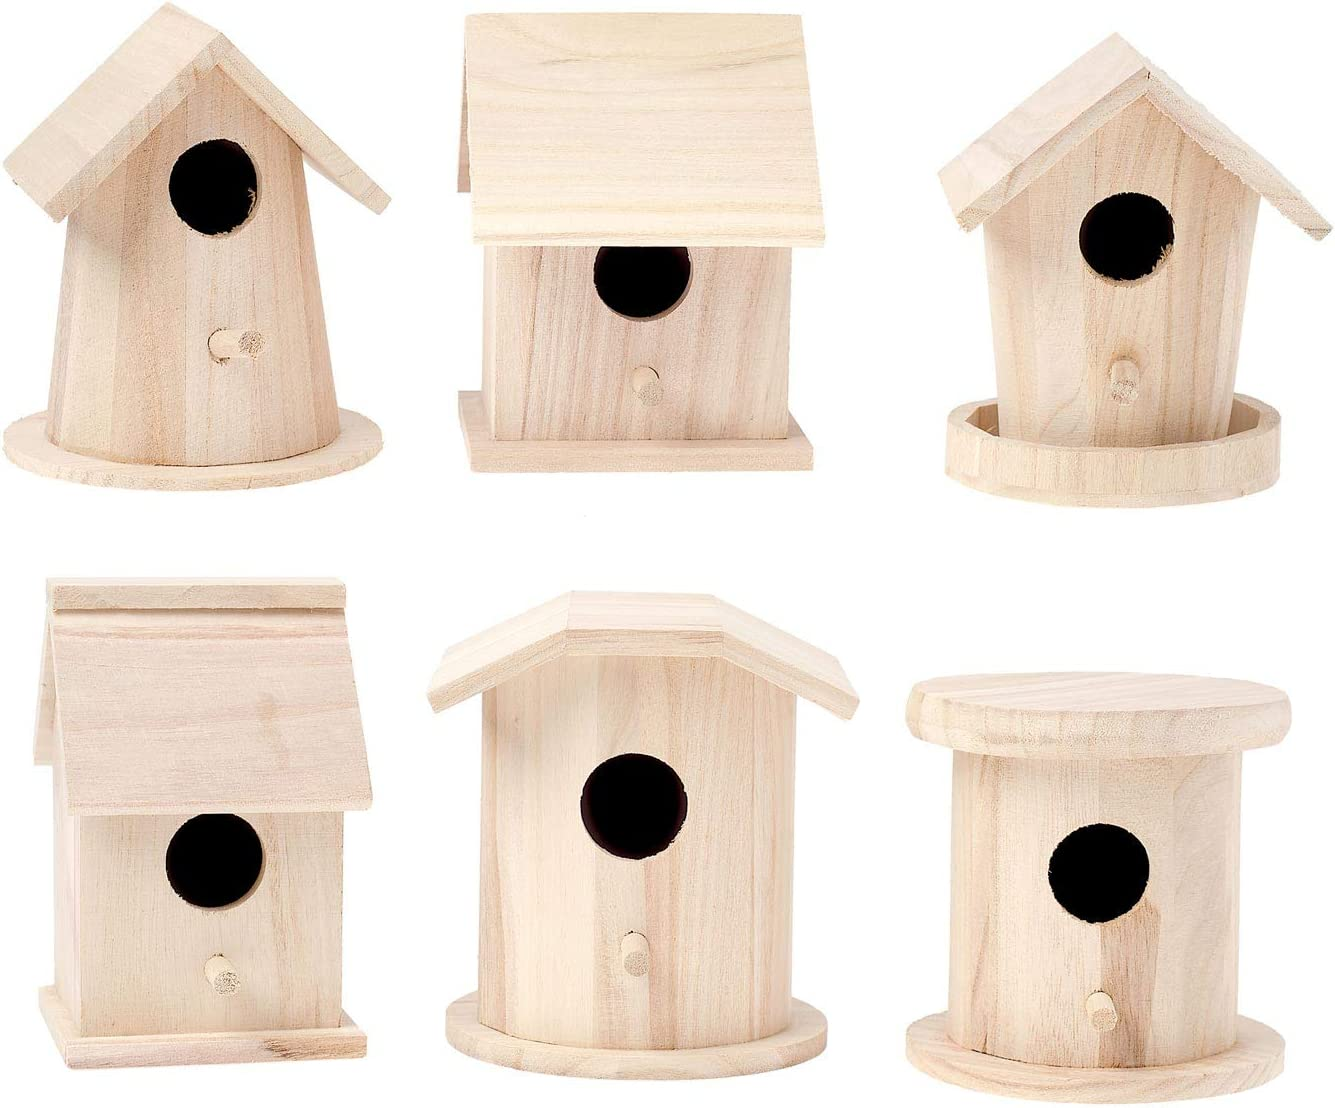 10 Bird Houses Raw Brass Jewelry Parts Crafts Birdhouse